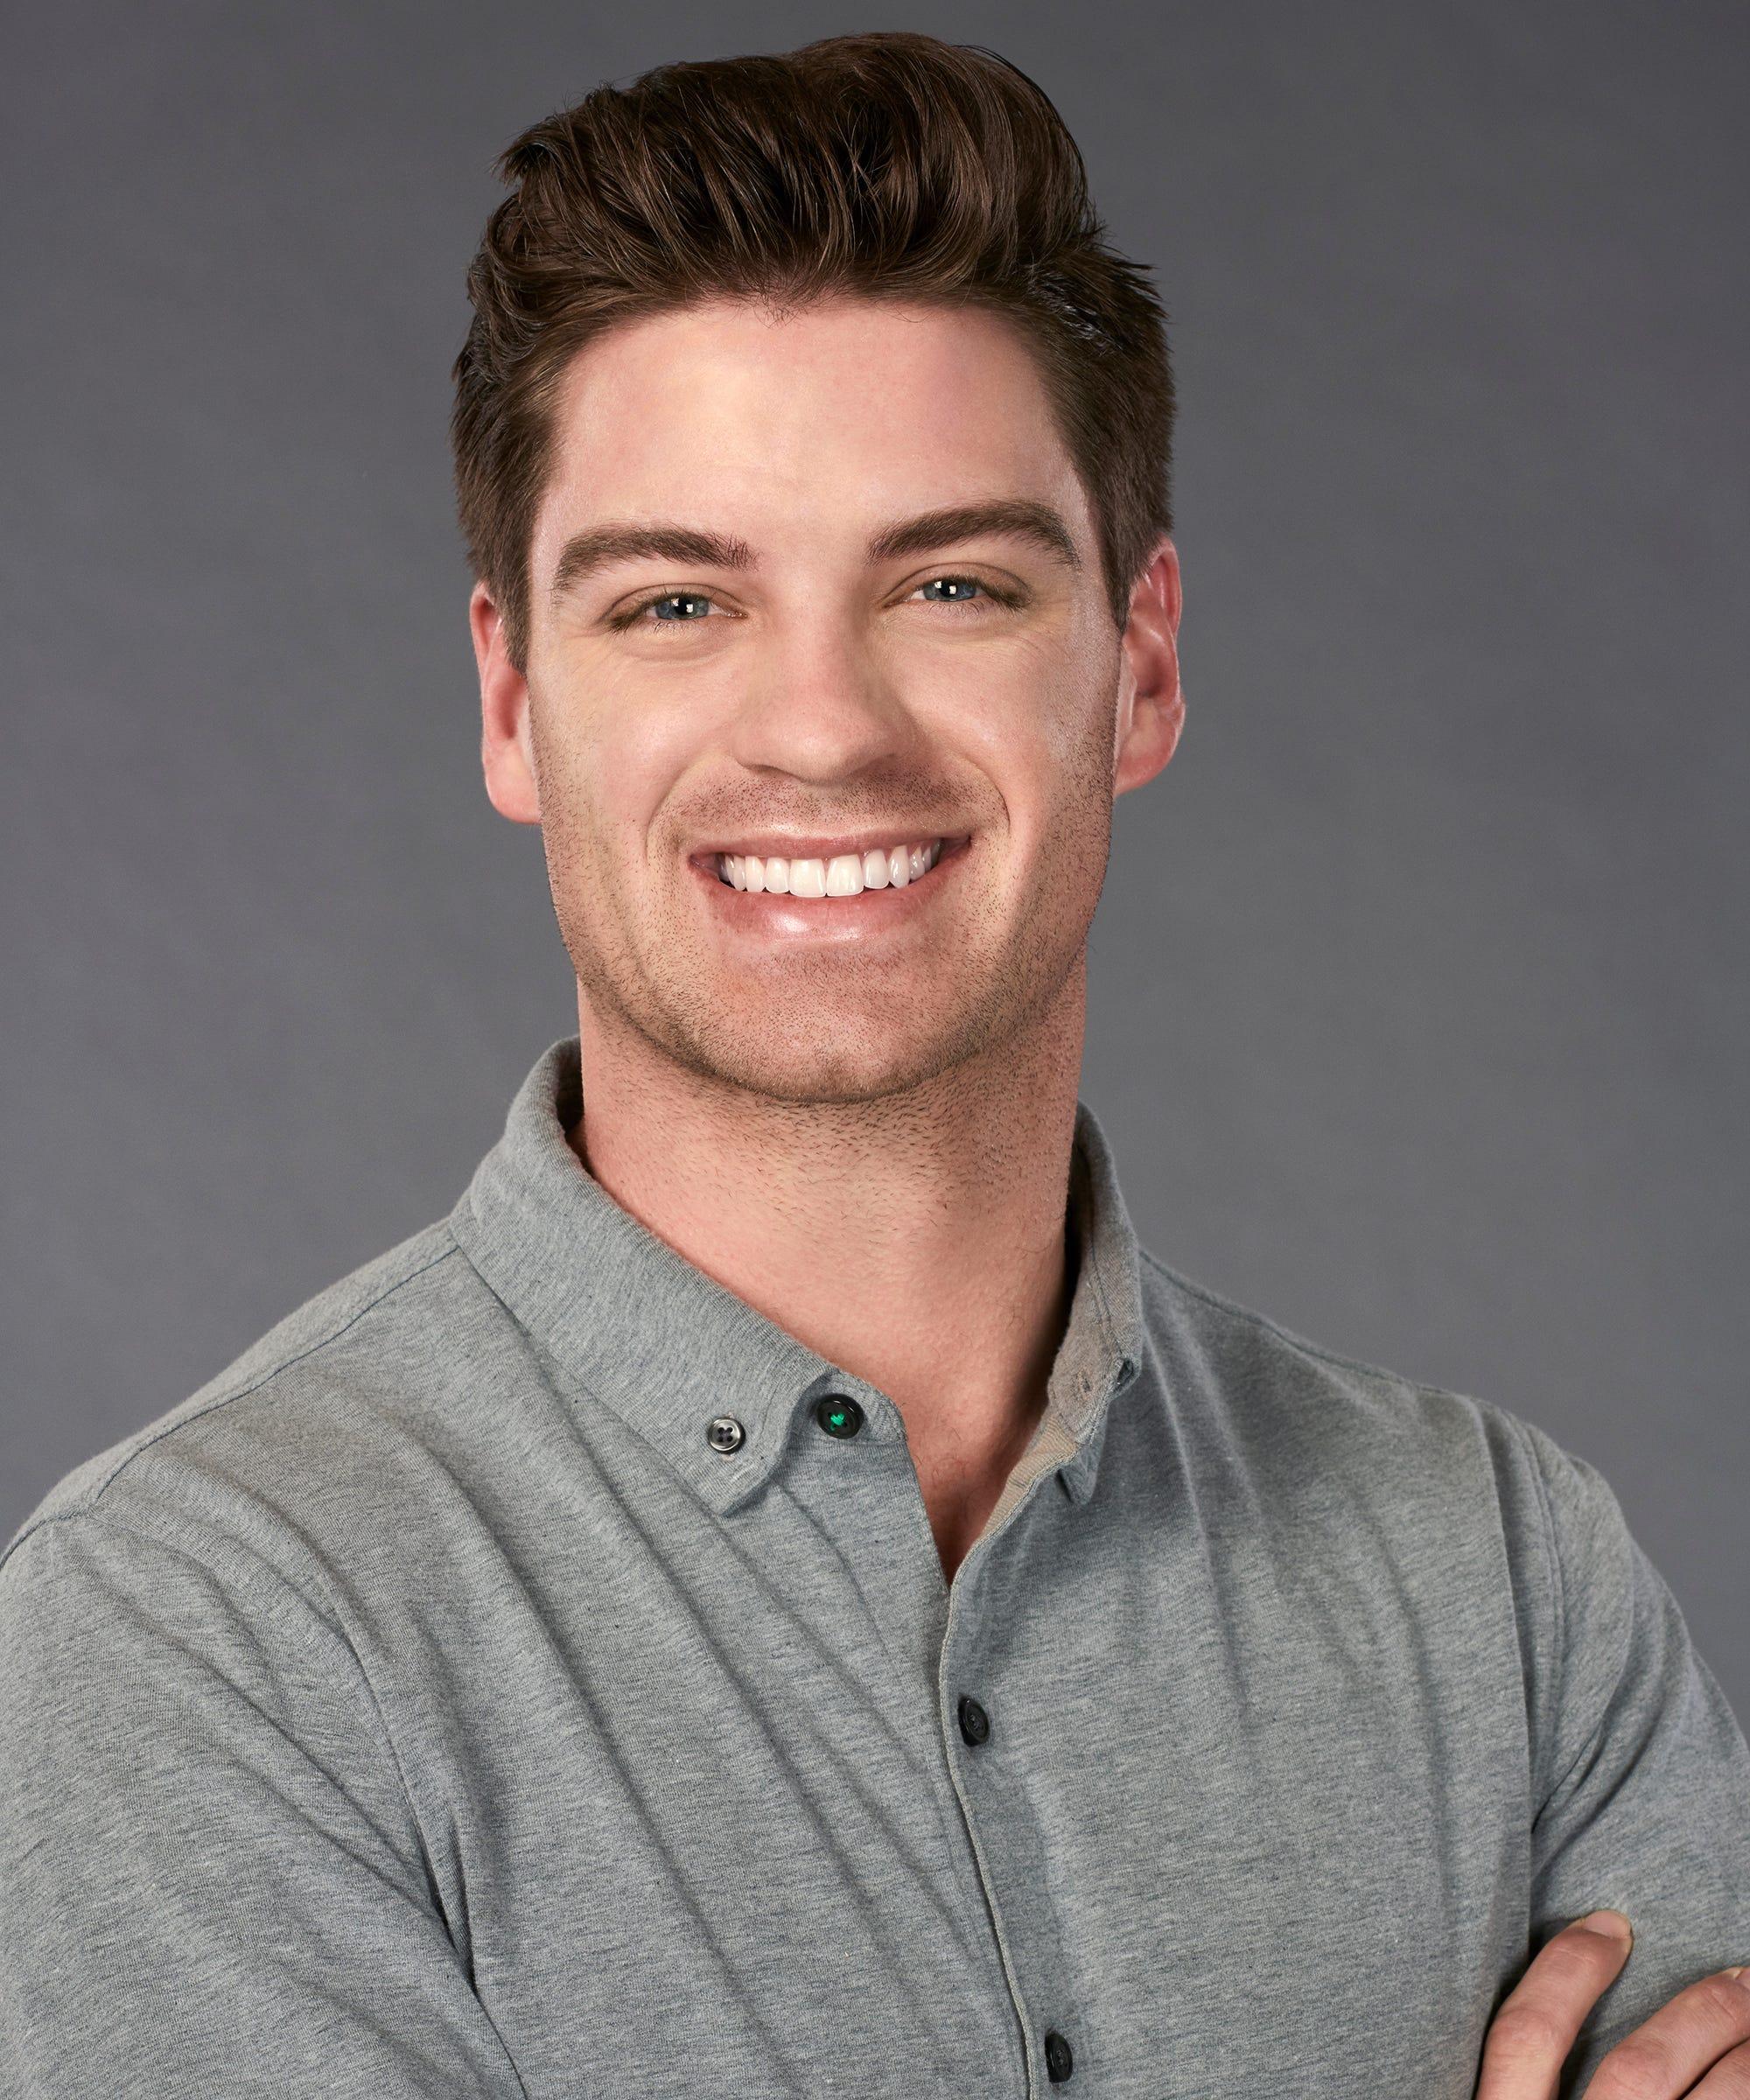 Where Has The Bachelorette's Garrett Been All Season?